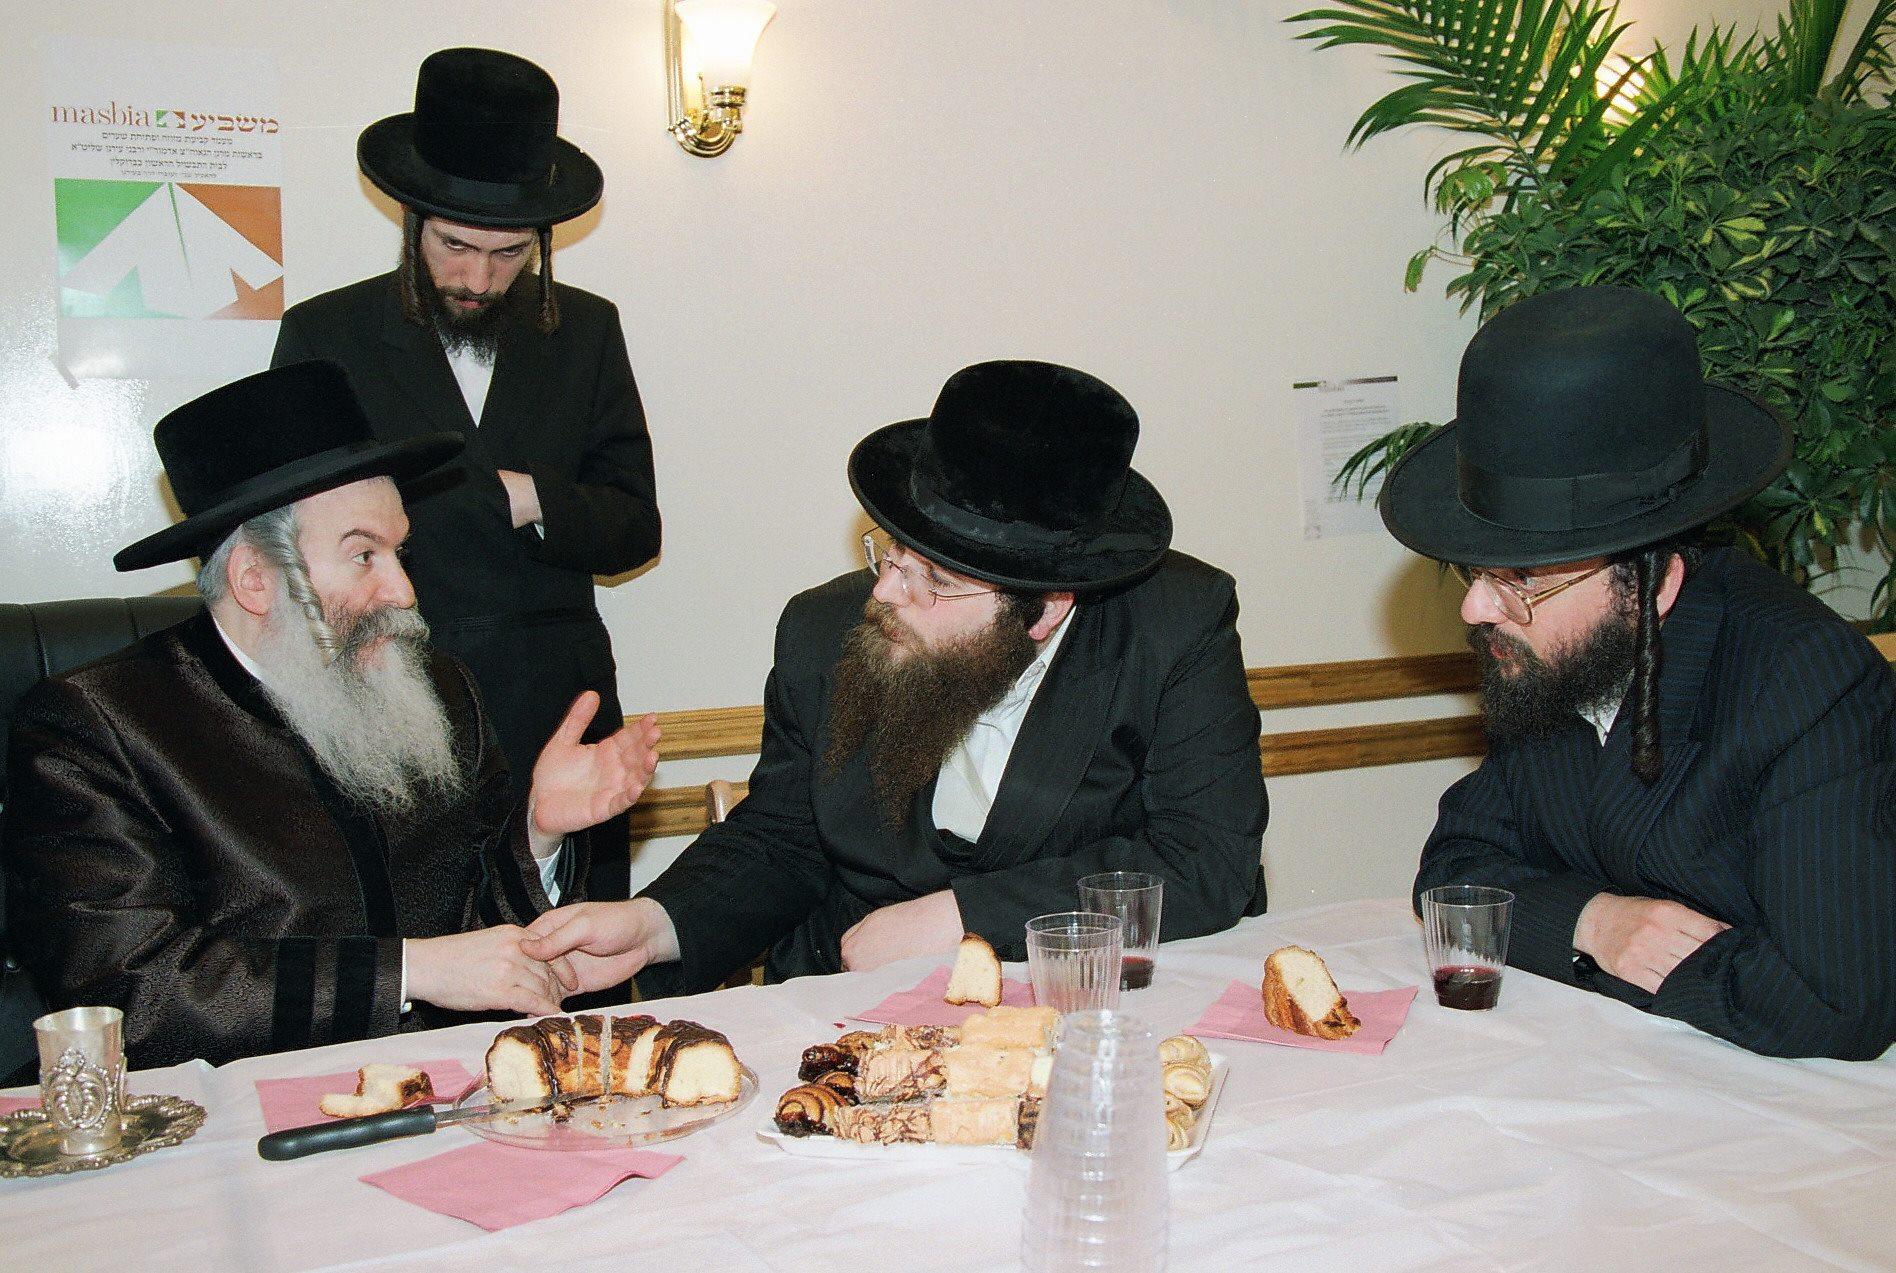 Masbia_Supporter__Bobover_Rebbe__Rabbi_Ben_Zion_Halberstam__Affixing_a_Mezuzah_at_Masbia_of_Boro_Park3.jpg